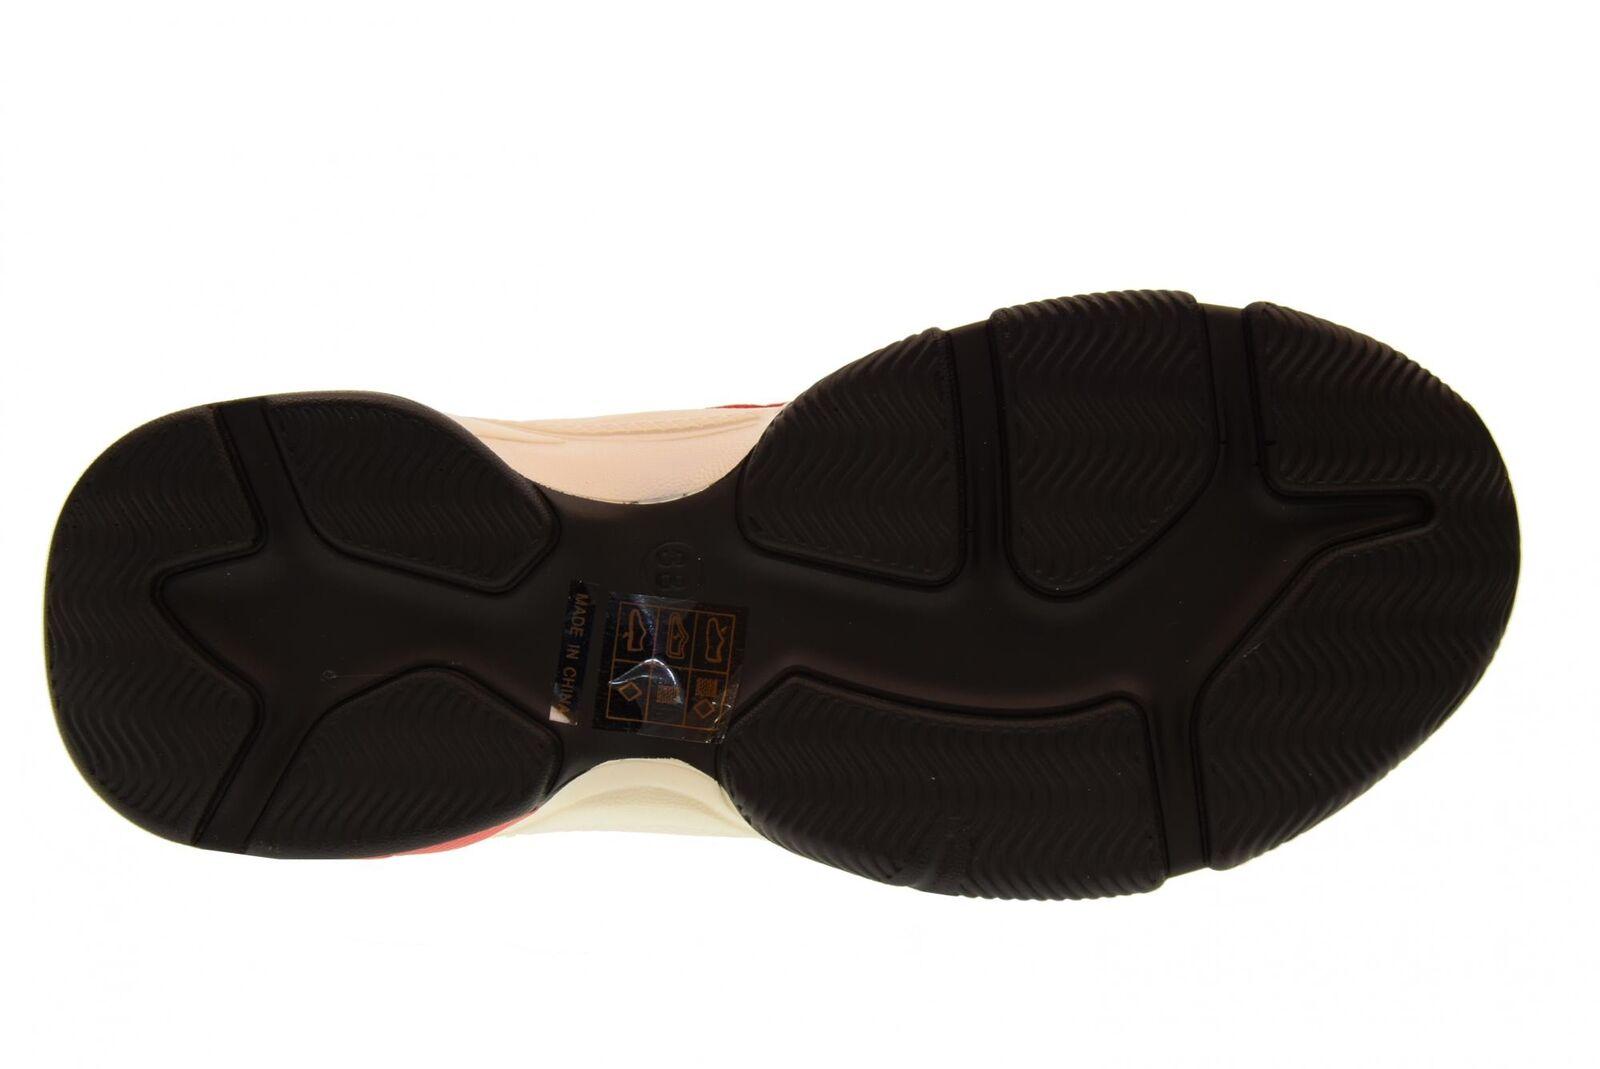 Gold&Gold A18f chaussures femme femme femme baskets basses gt529 RED | Vente  | Digne  8c09d0